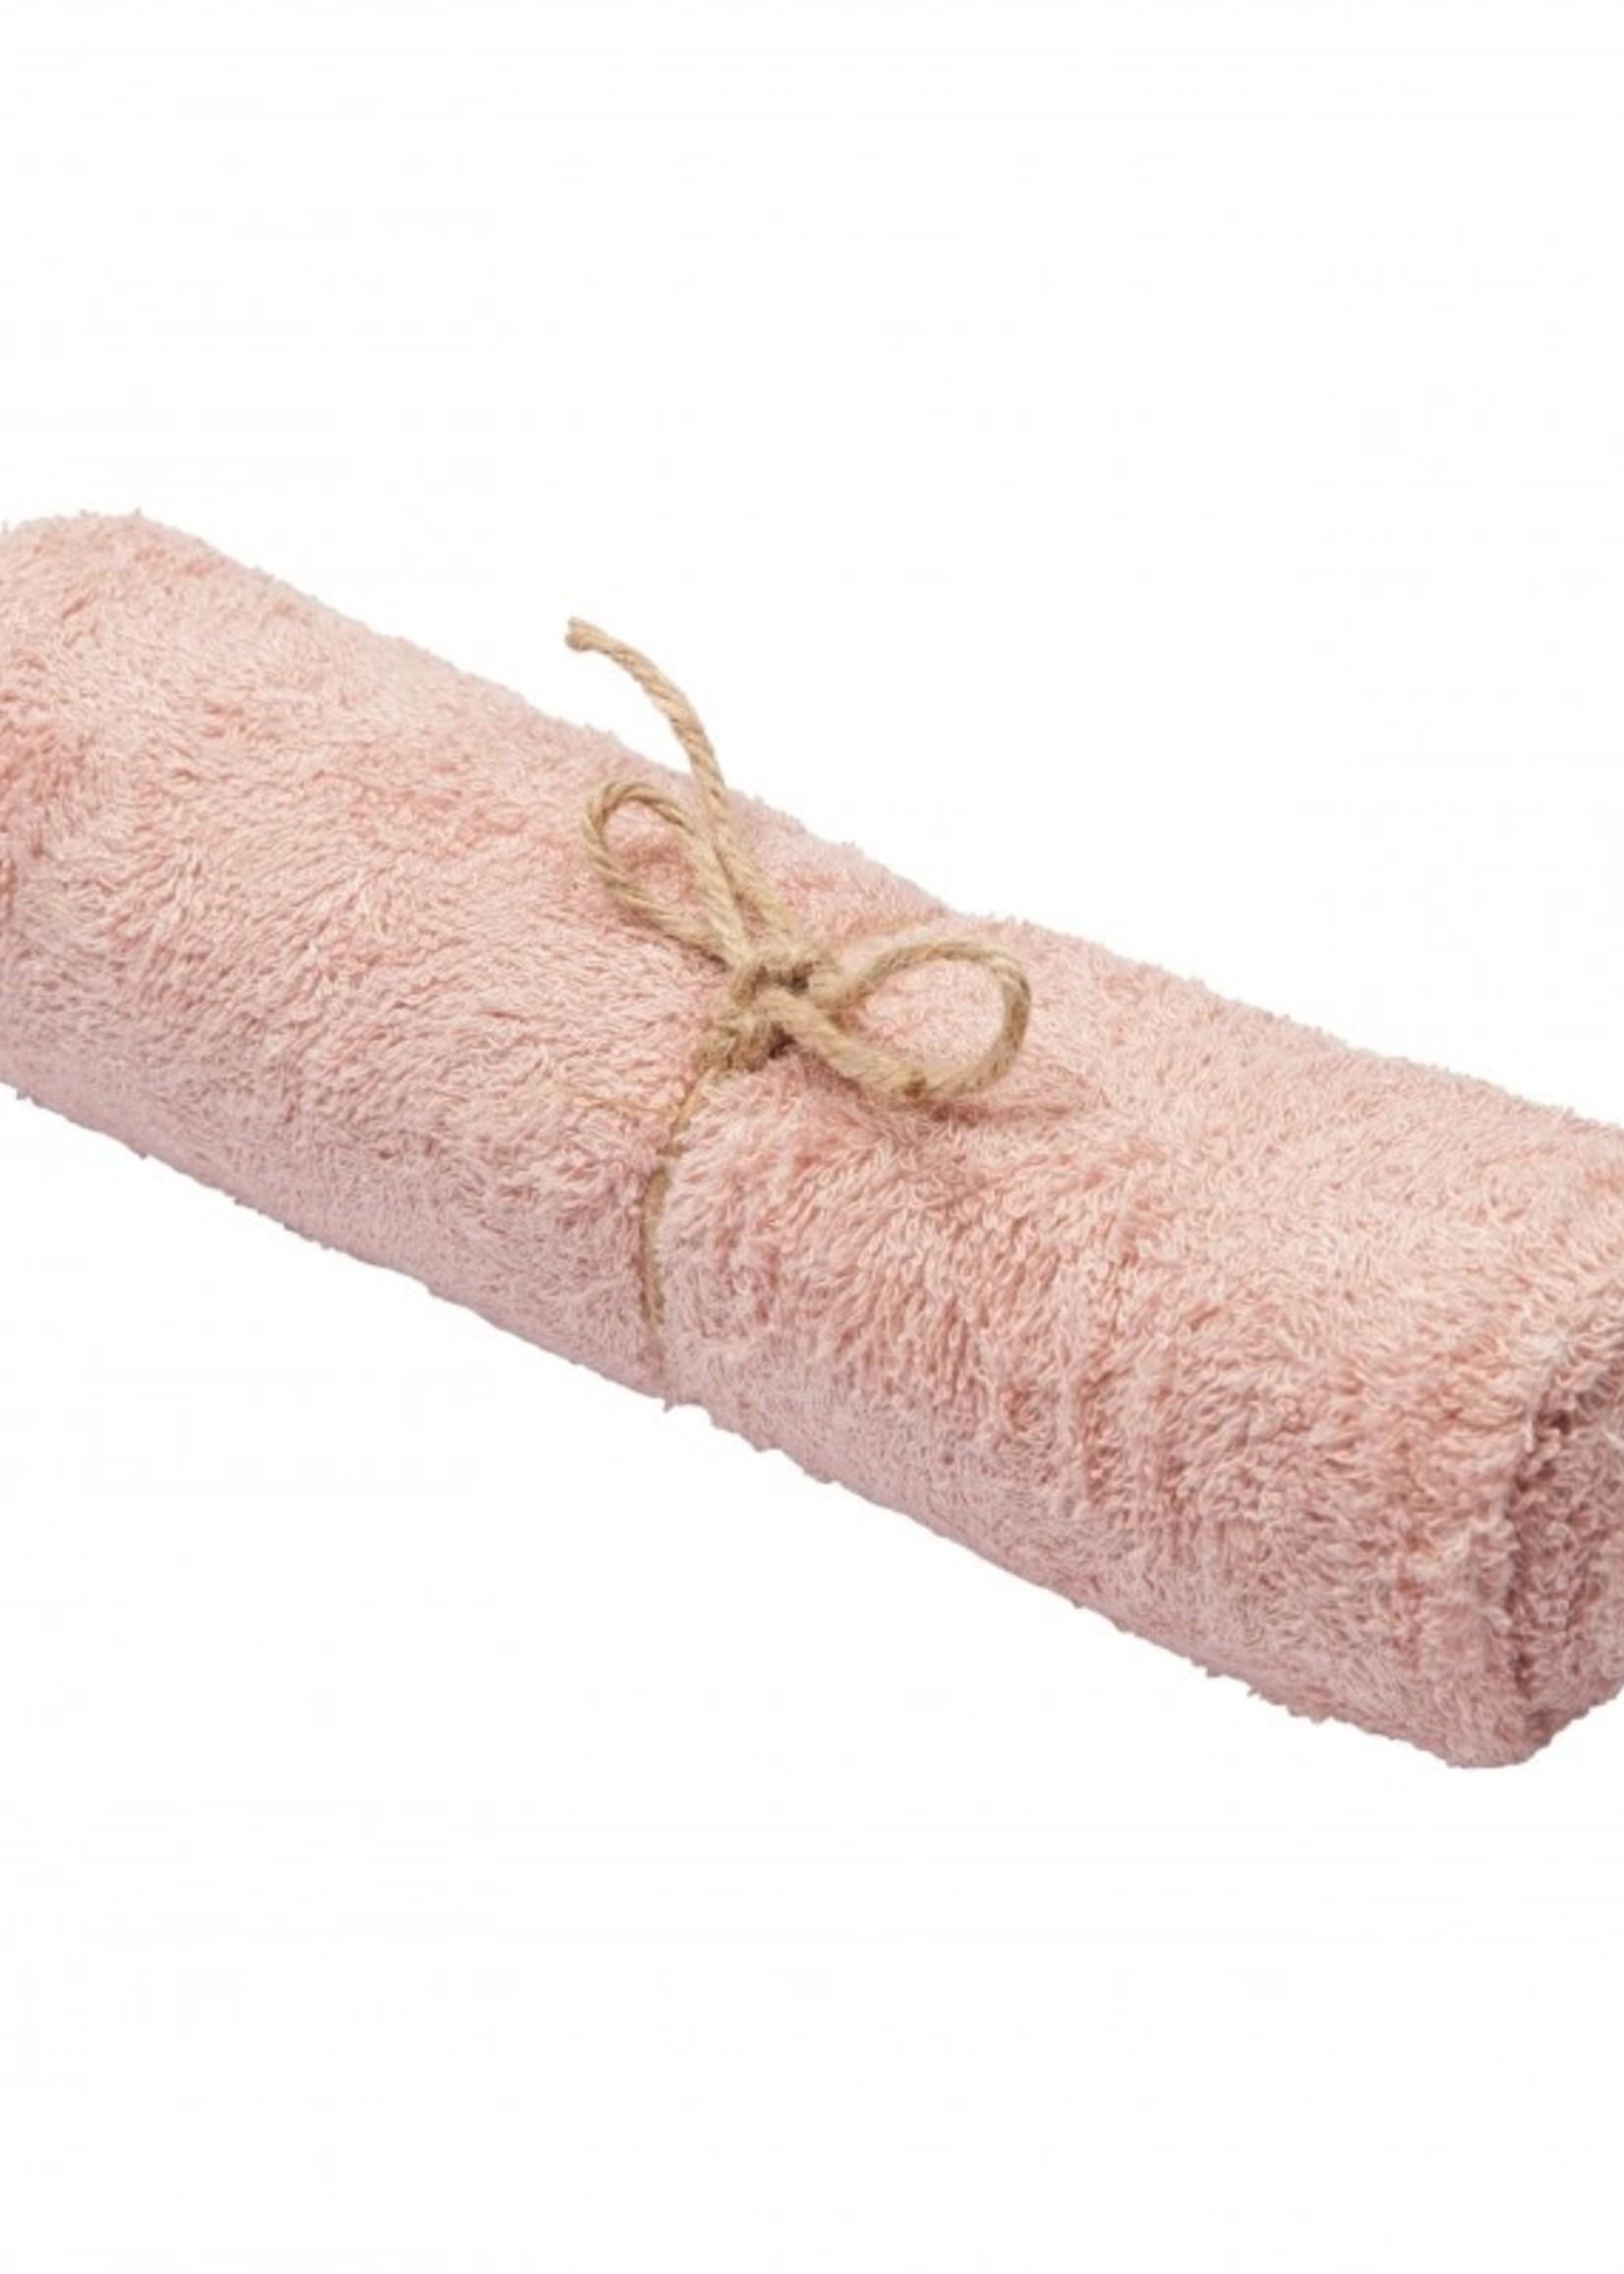 Timboo Towel Medium - Misty Rose